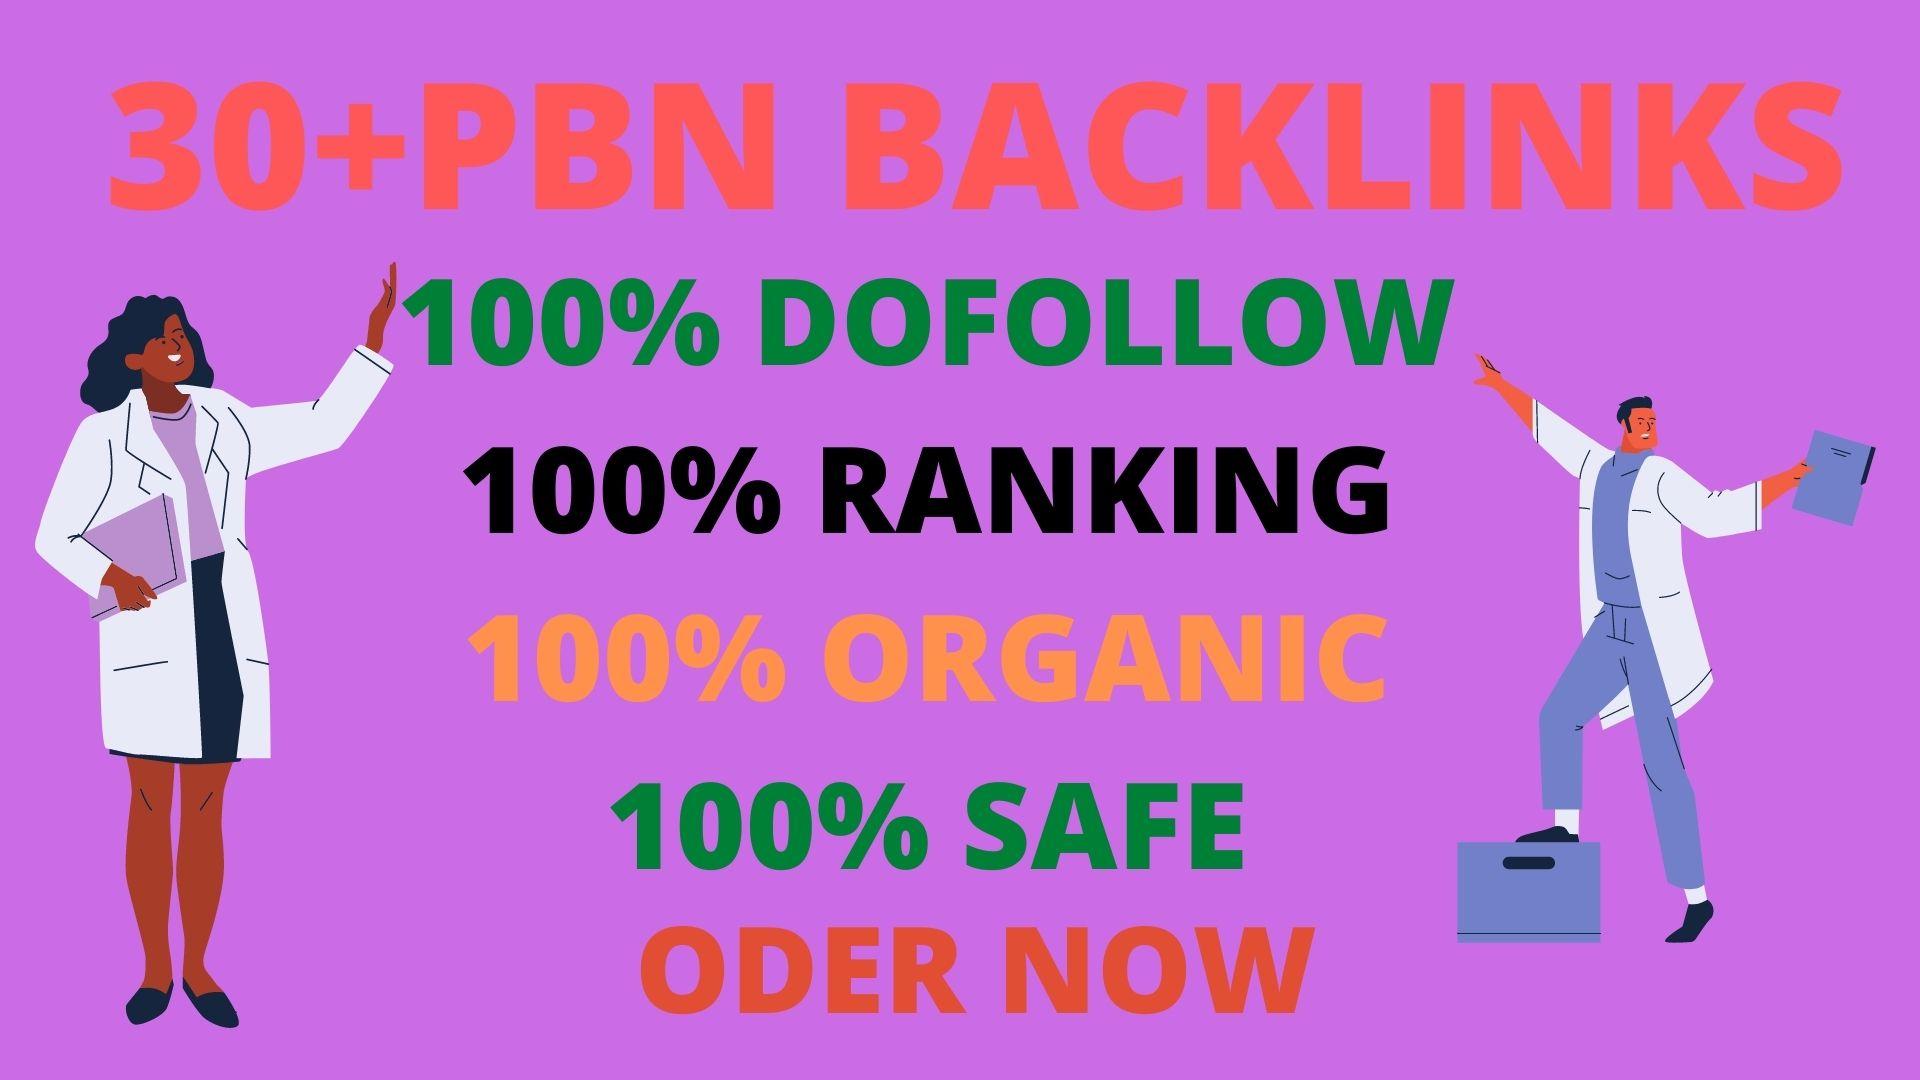 Get 30+High DA 60+PBN Backlink to Rank Your Website